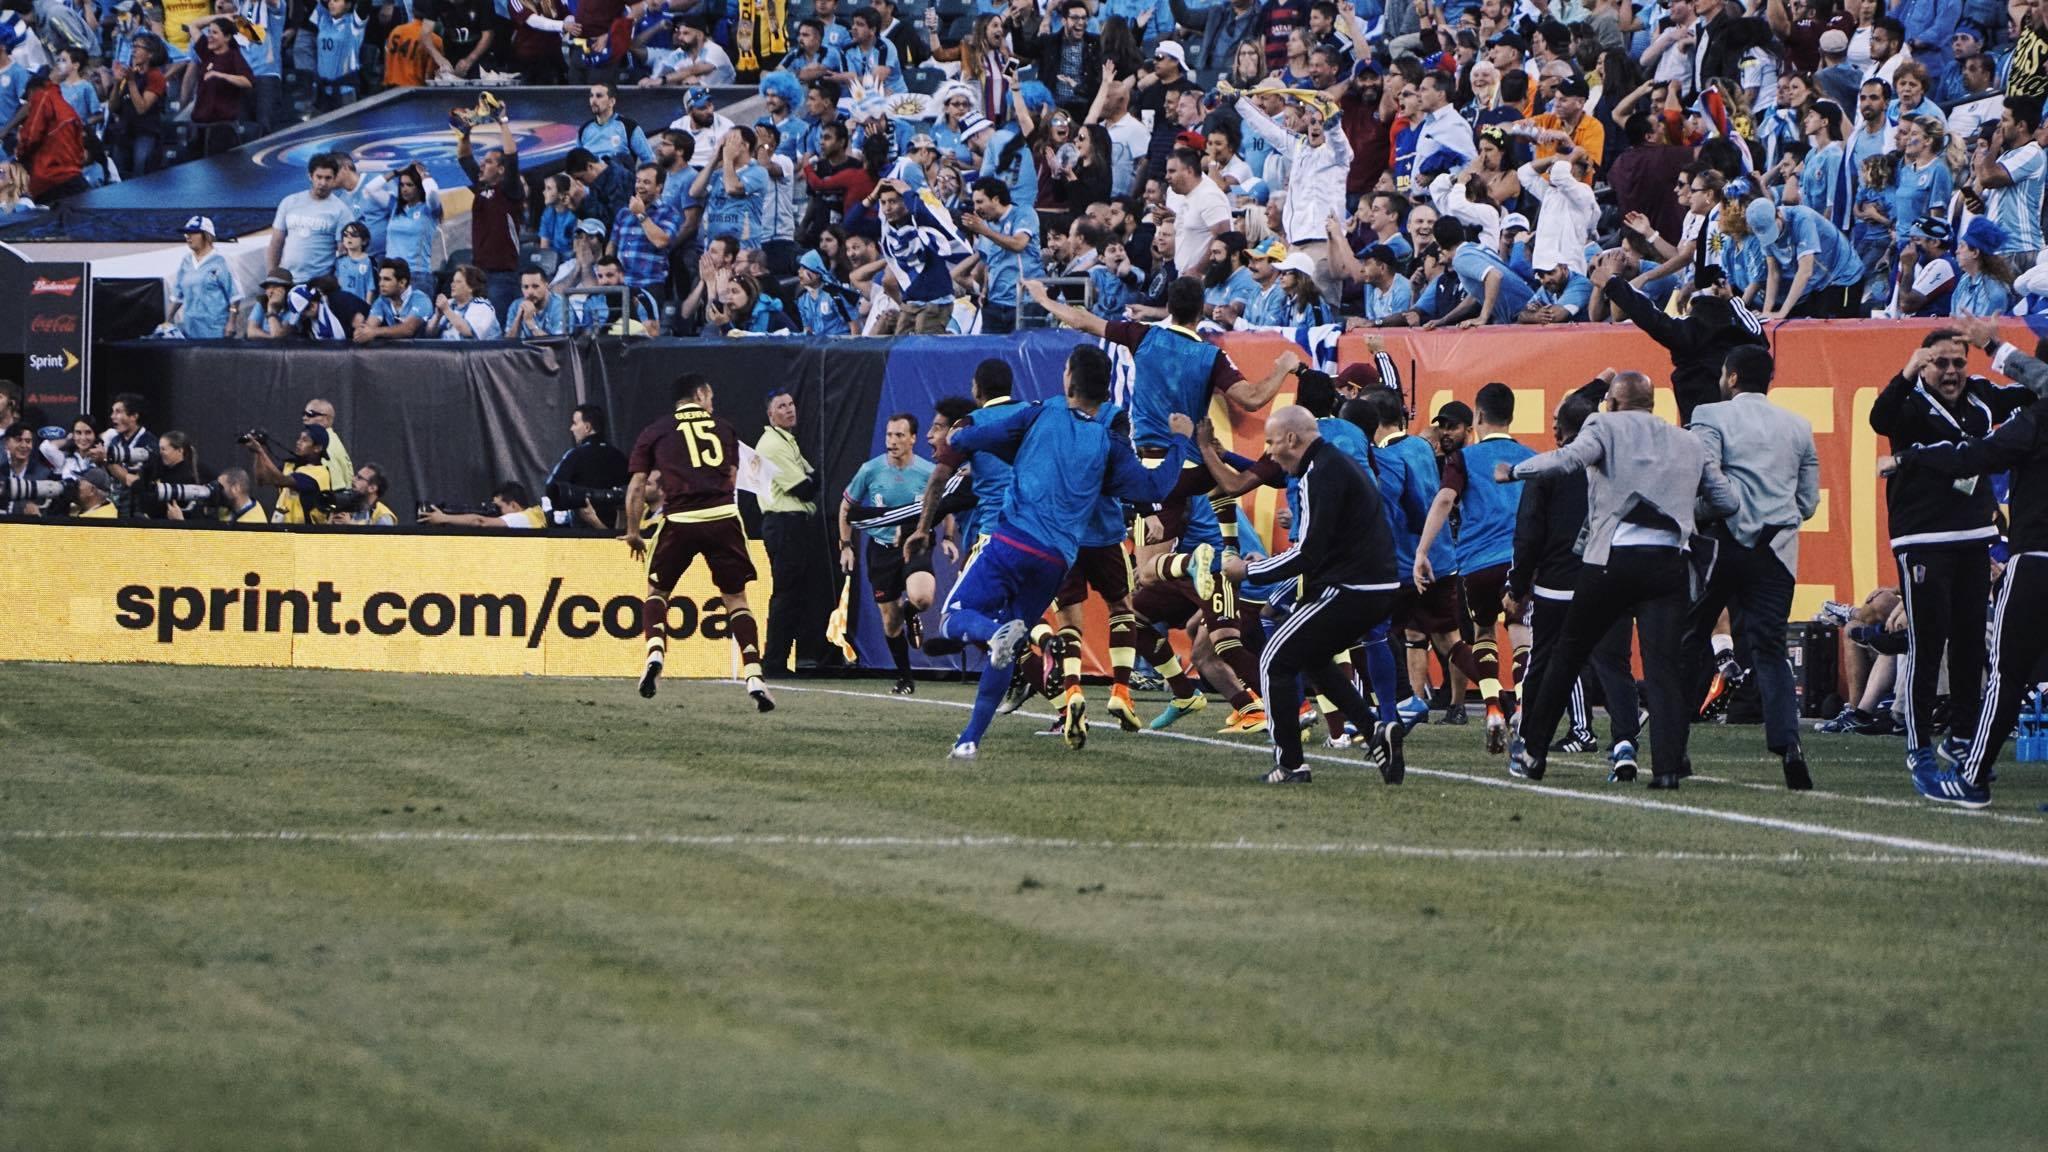 Venezuela reacts to a Jose Rondon goal scored in the first half of their Copa America match against Uruguay.Venezuela defeated Uruguay 1-0.